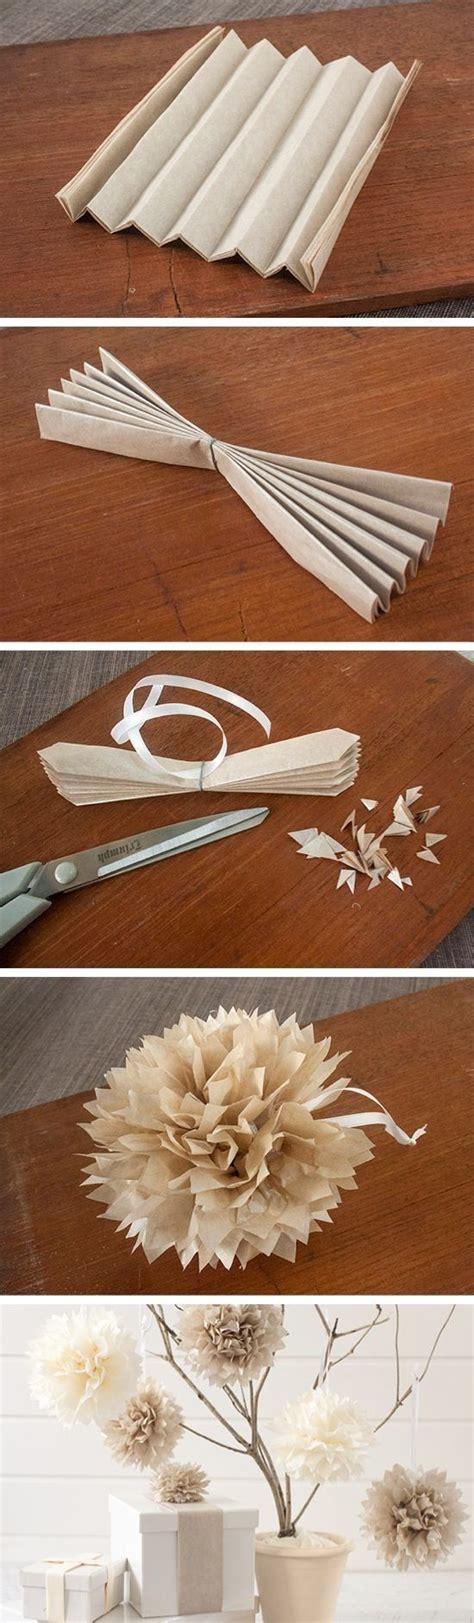 Craft Paper Decorations - 14 diy decor ideas paper pom poms paper poms